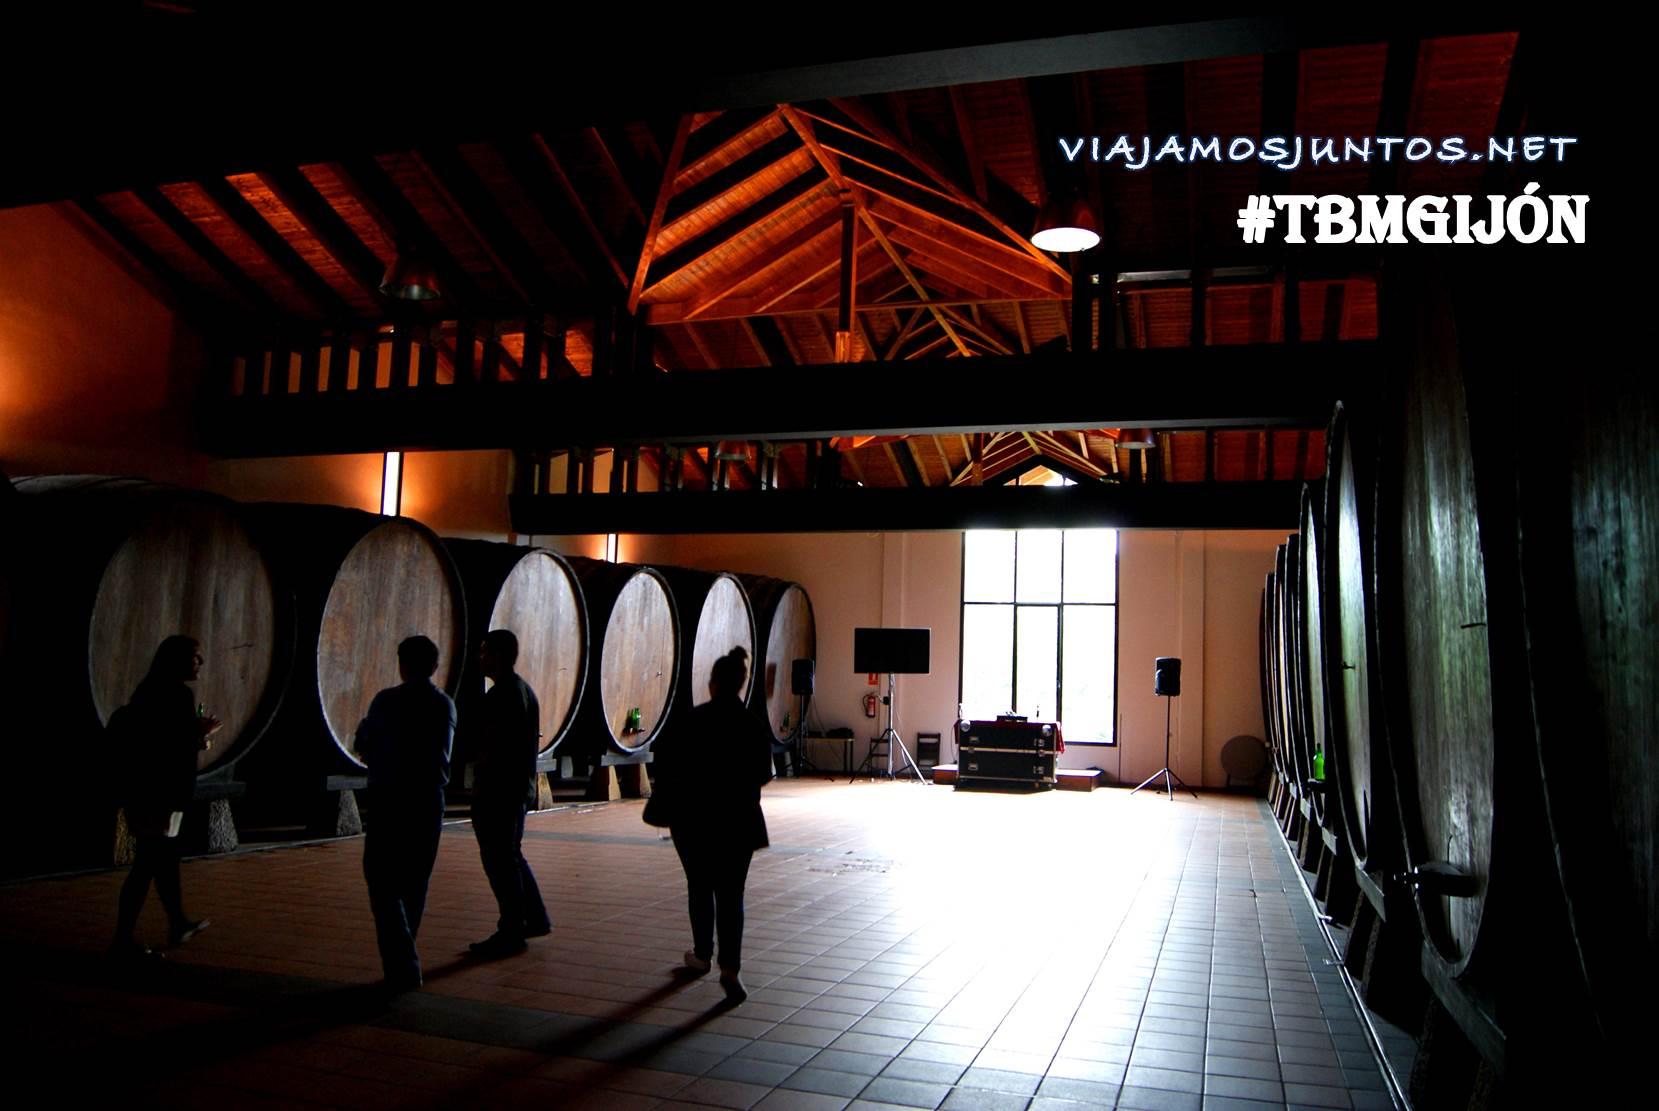 Gijón, Asturias, ecomuseo minero, TBM, TBMGijón, bloggers, travel bloggers meeting, surf, talasoponiente, acuario, jardín botánico, gallar, sidrería, sidra